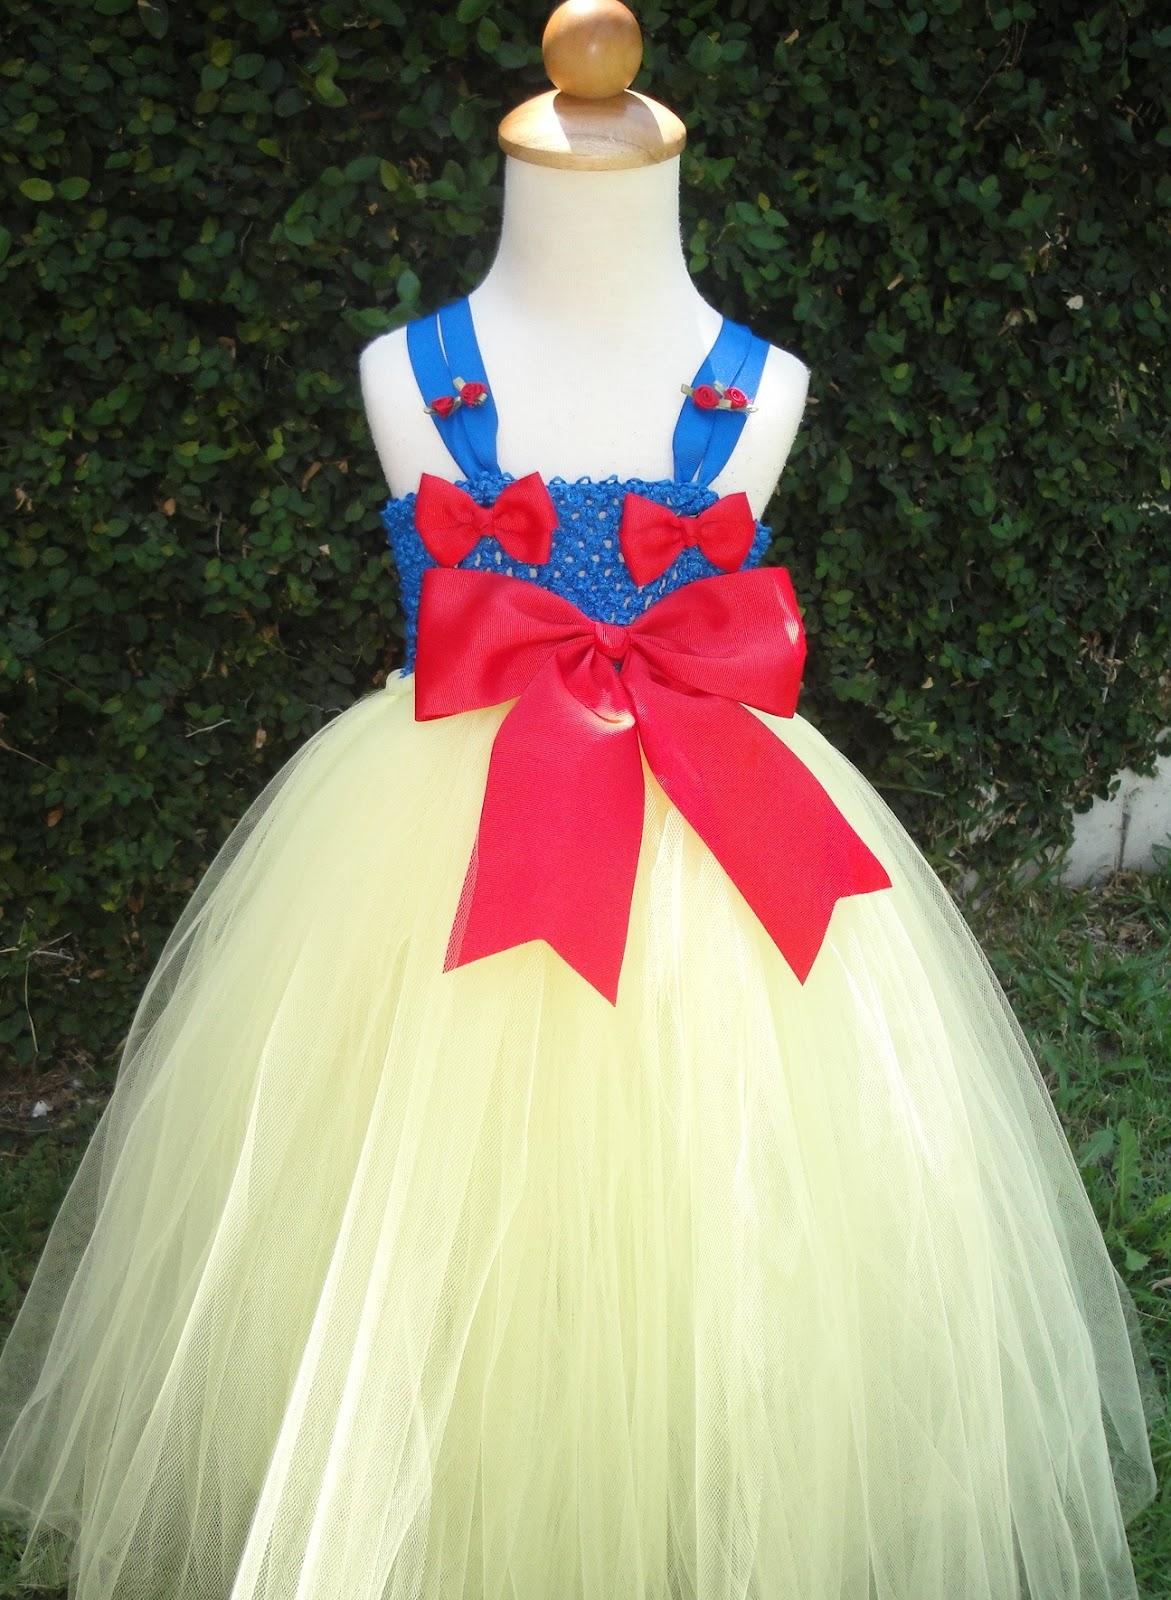 Hollywoodtutu Dresses Snow White Baby Girl Tutu Dress Costume